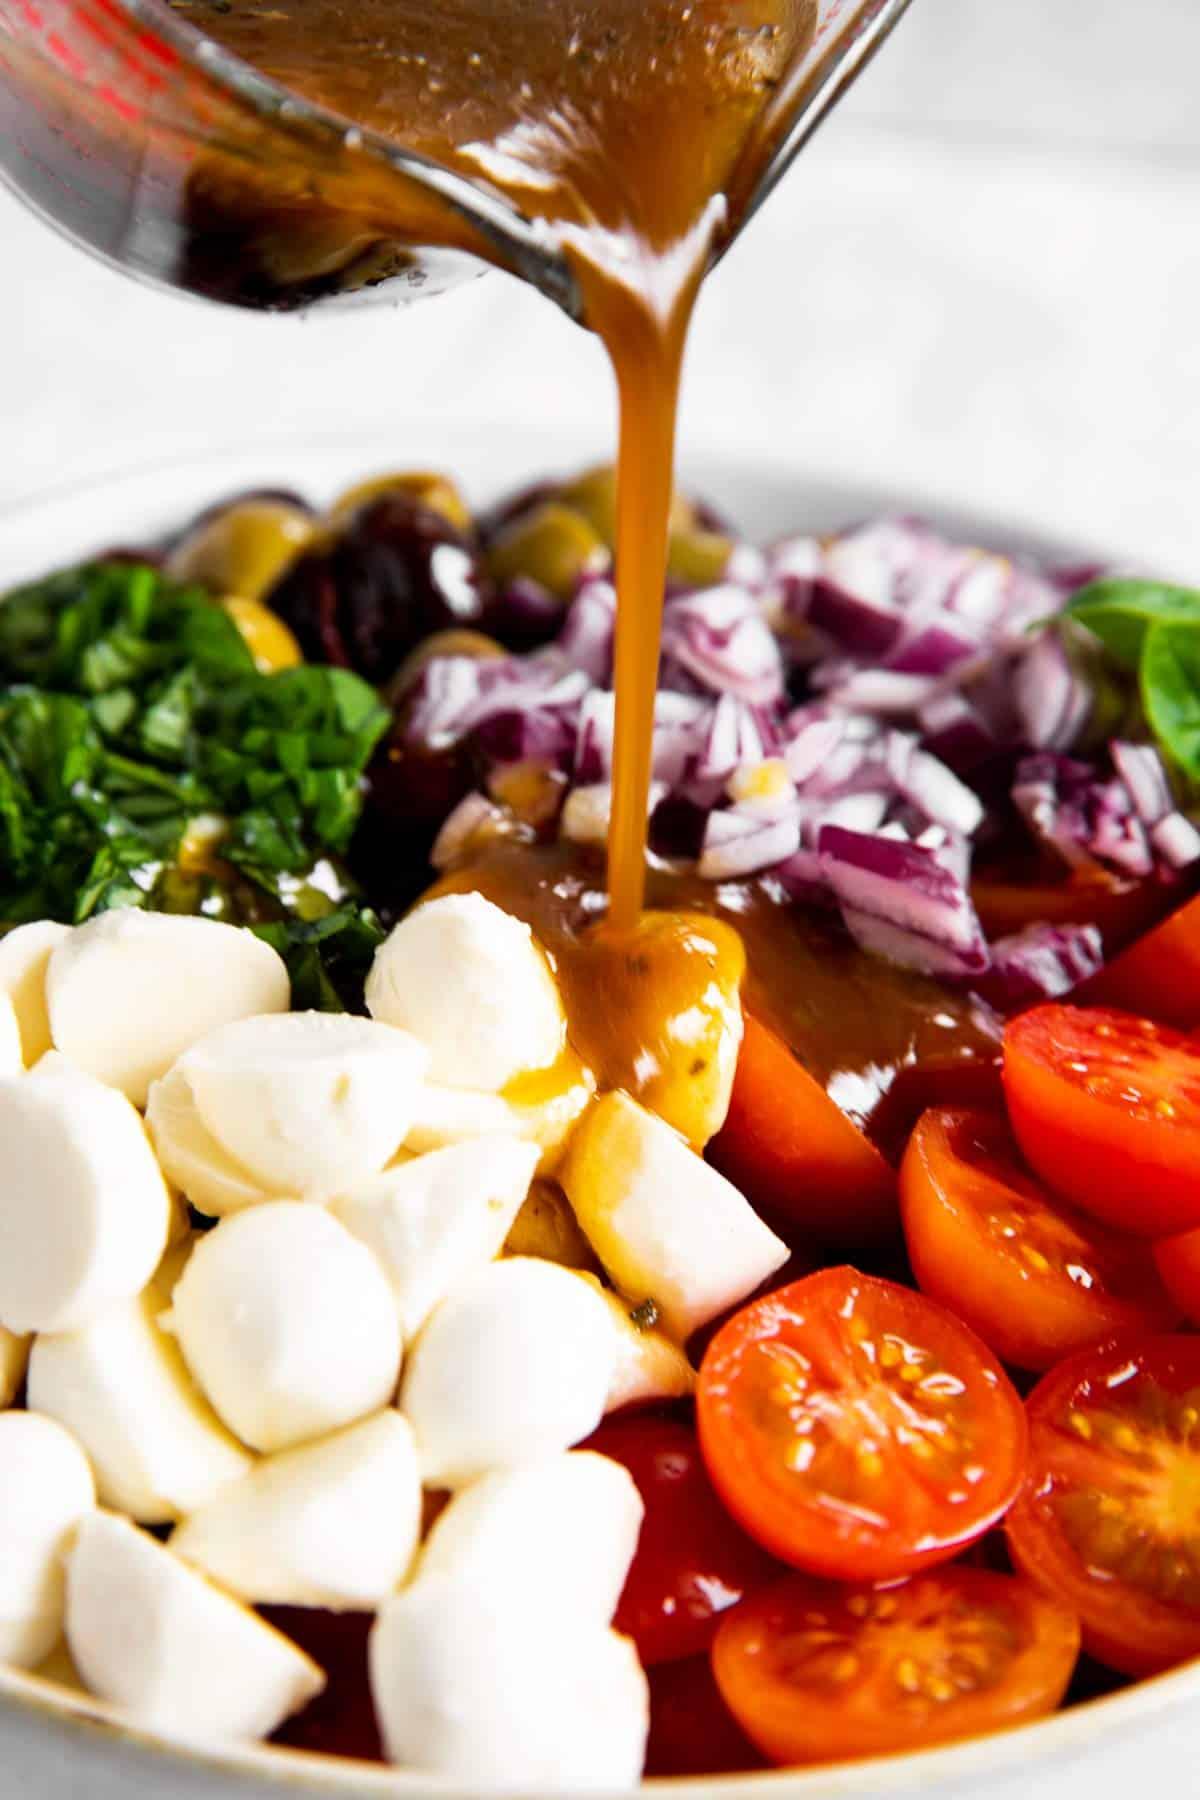 pouring balsamic vinaigrette dressing over ingredients for cherry tomato salad